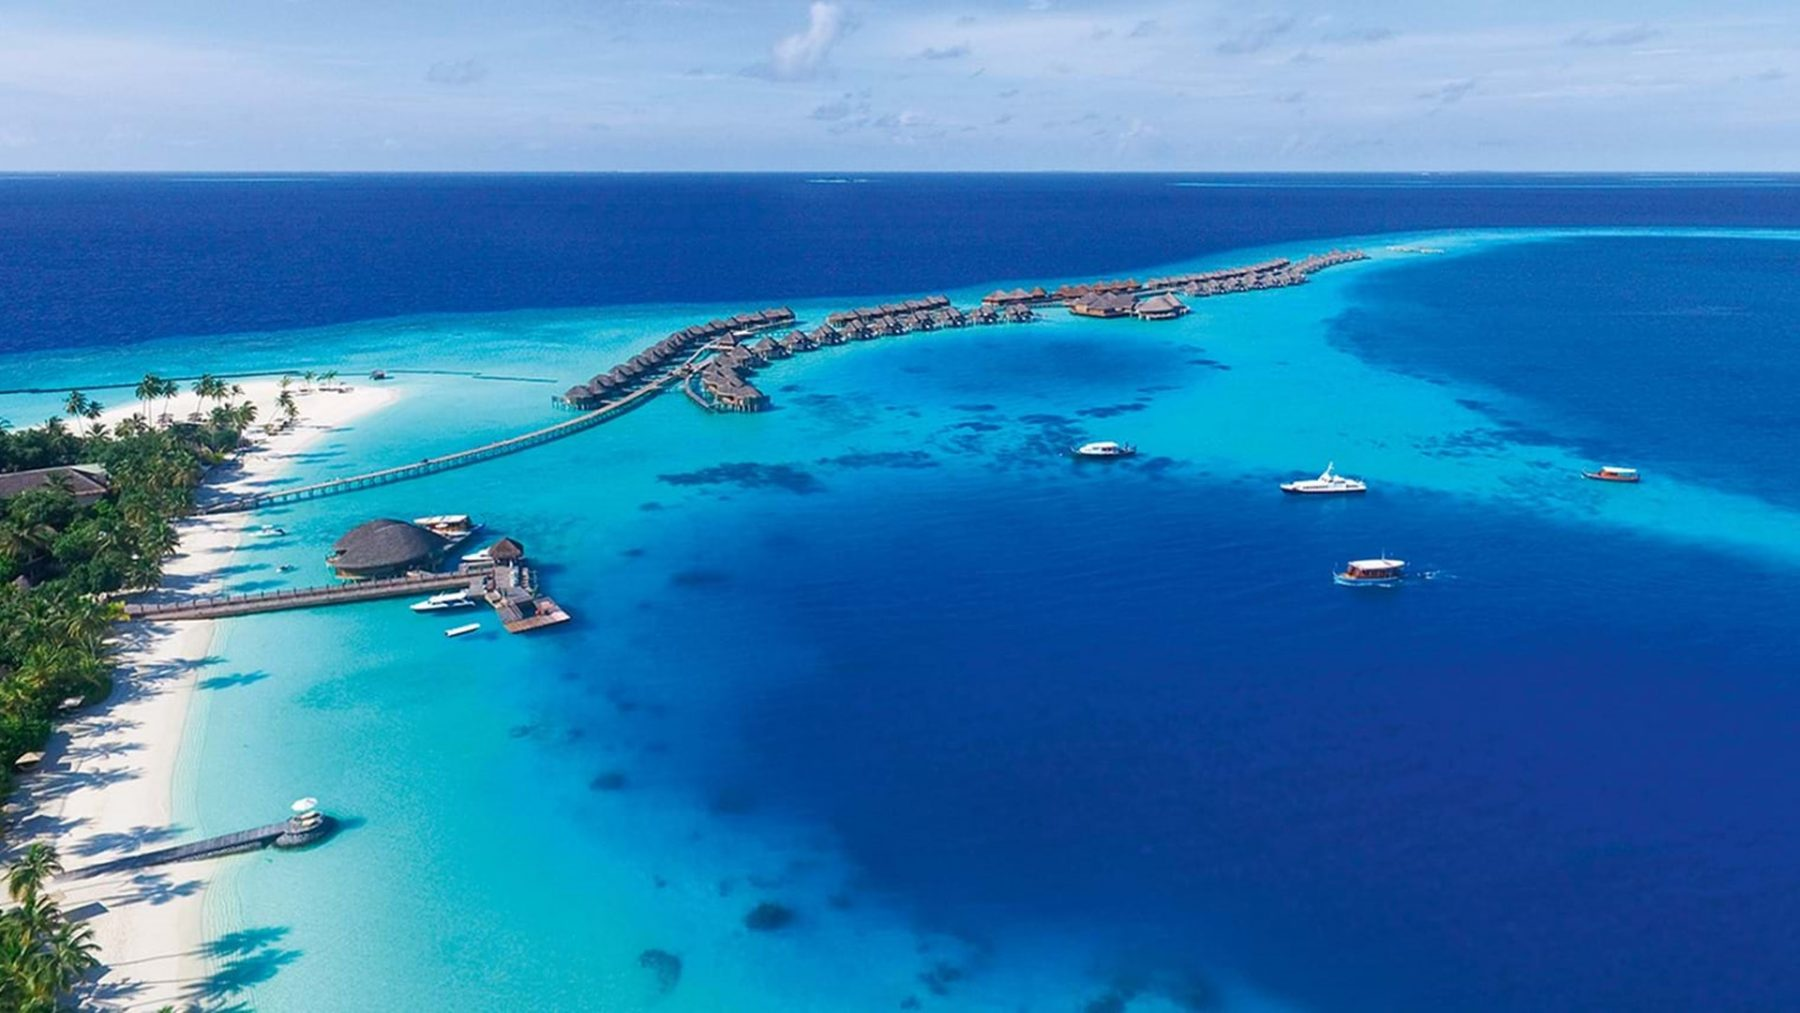 constance-halaveli-maldives-overview-1